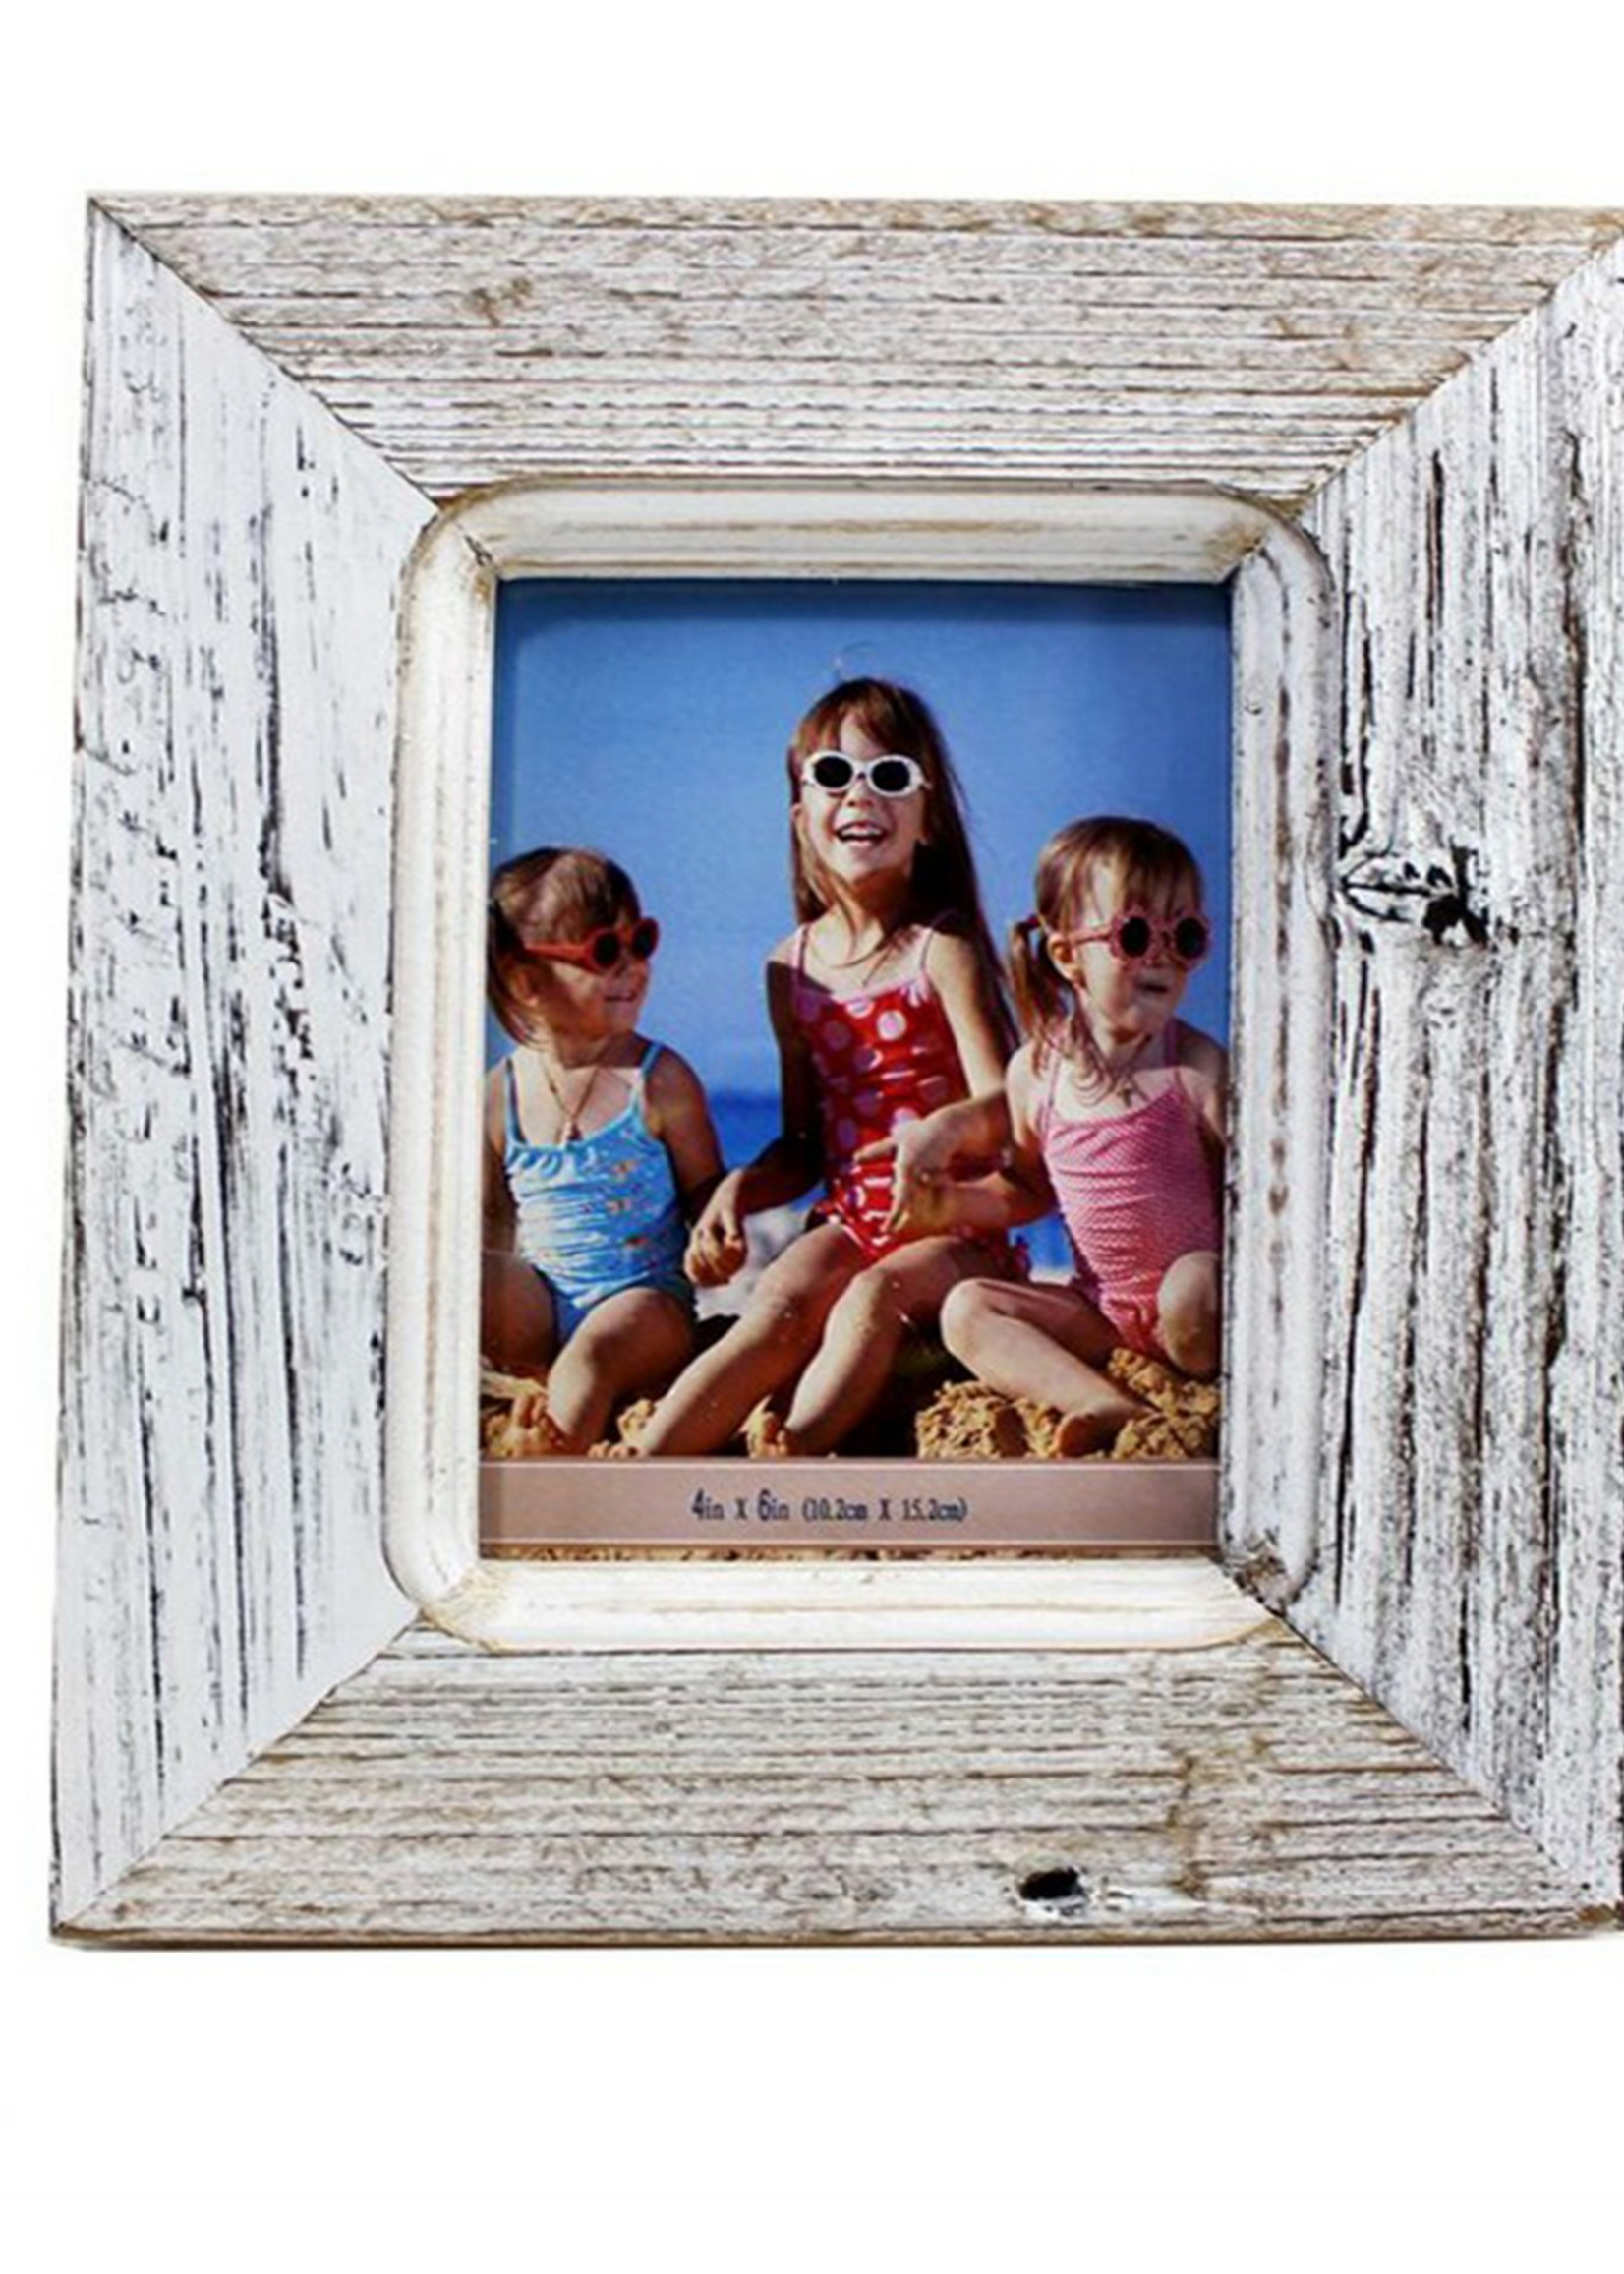 4x6 rustic white wood frame